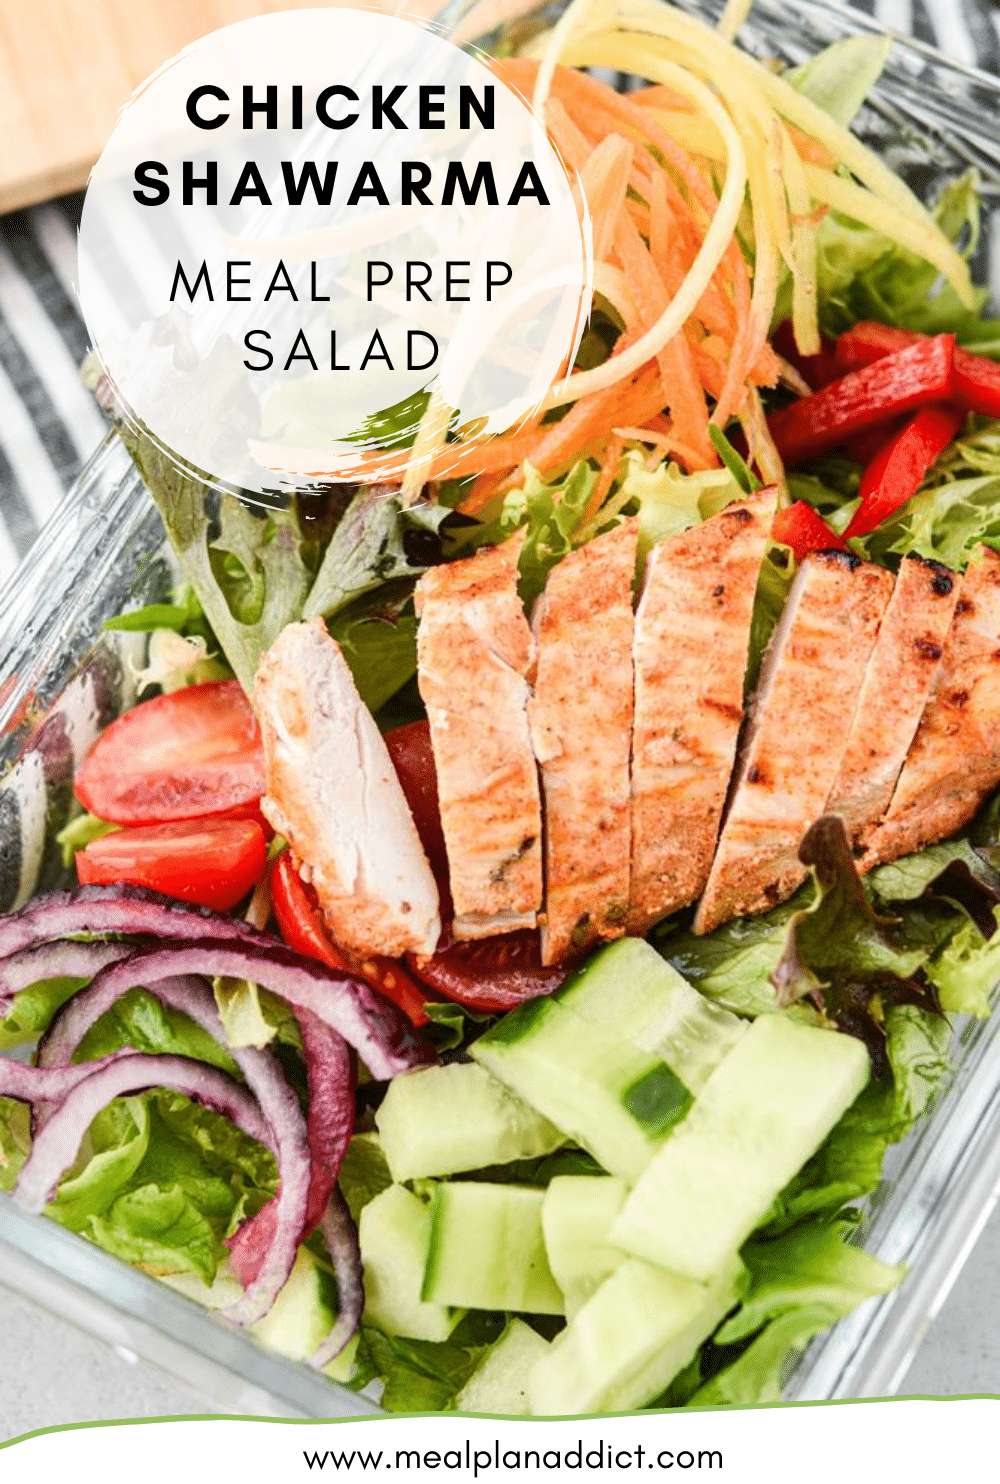 Chicken Shawarma Meal Prep Salad